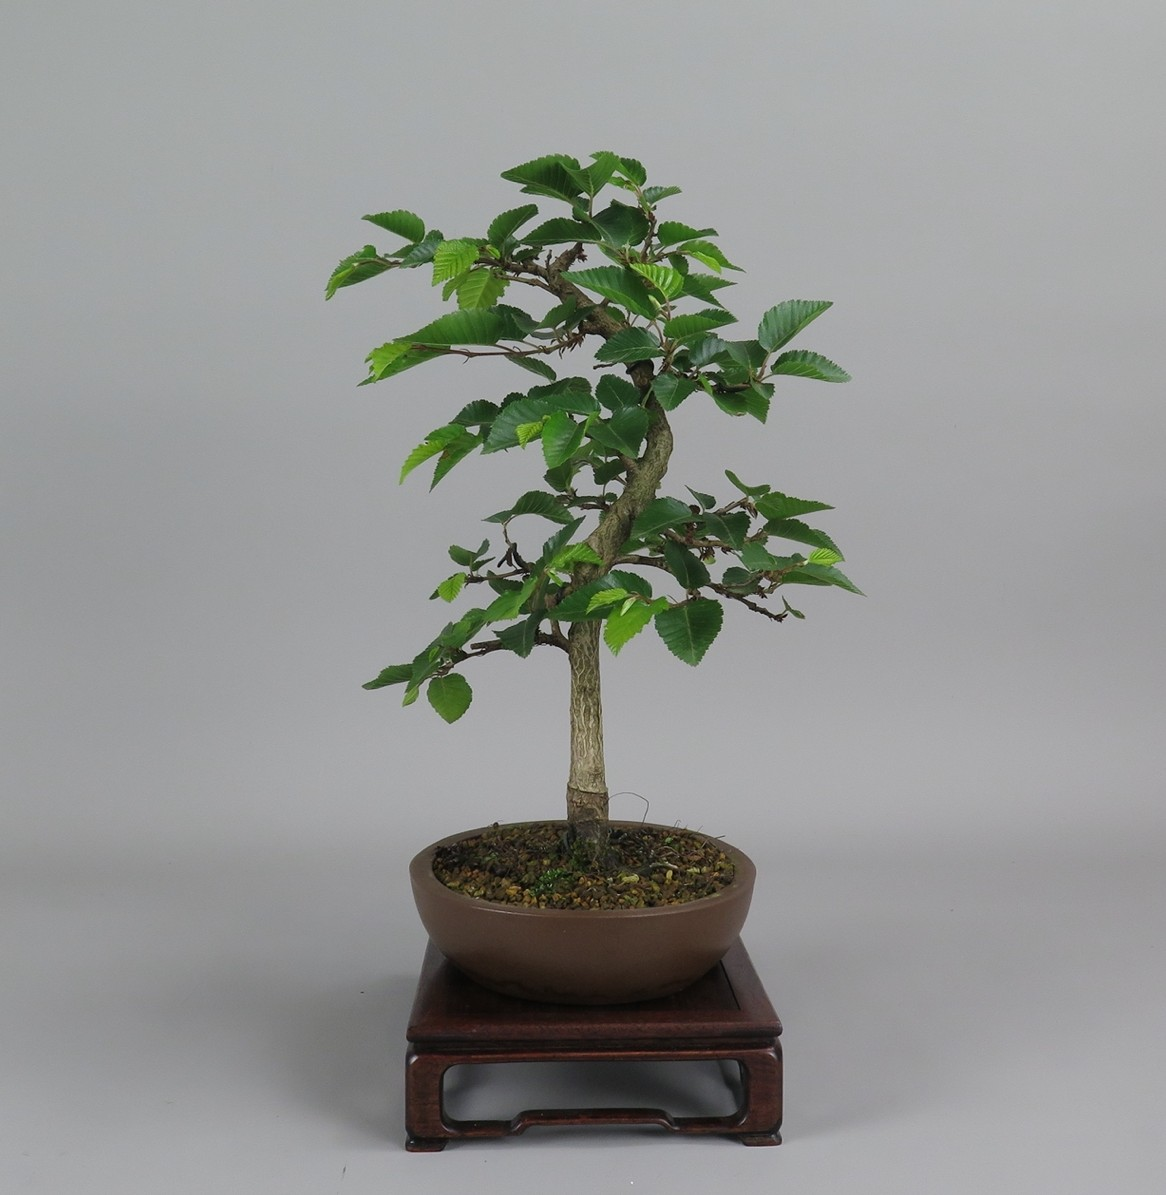 bonsai de carpe, lateral izquierdo